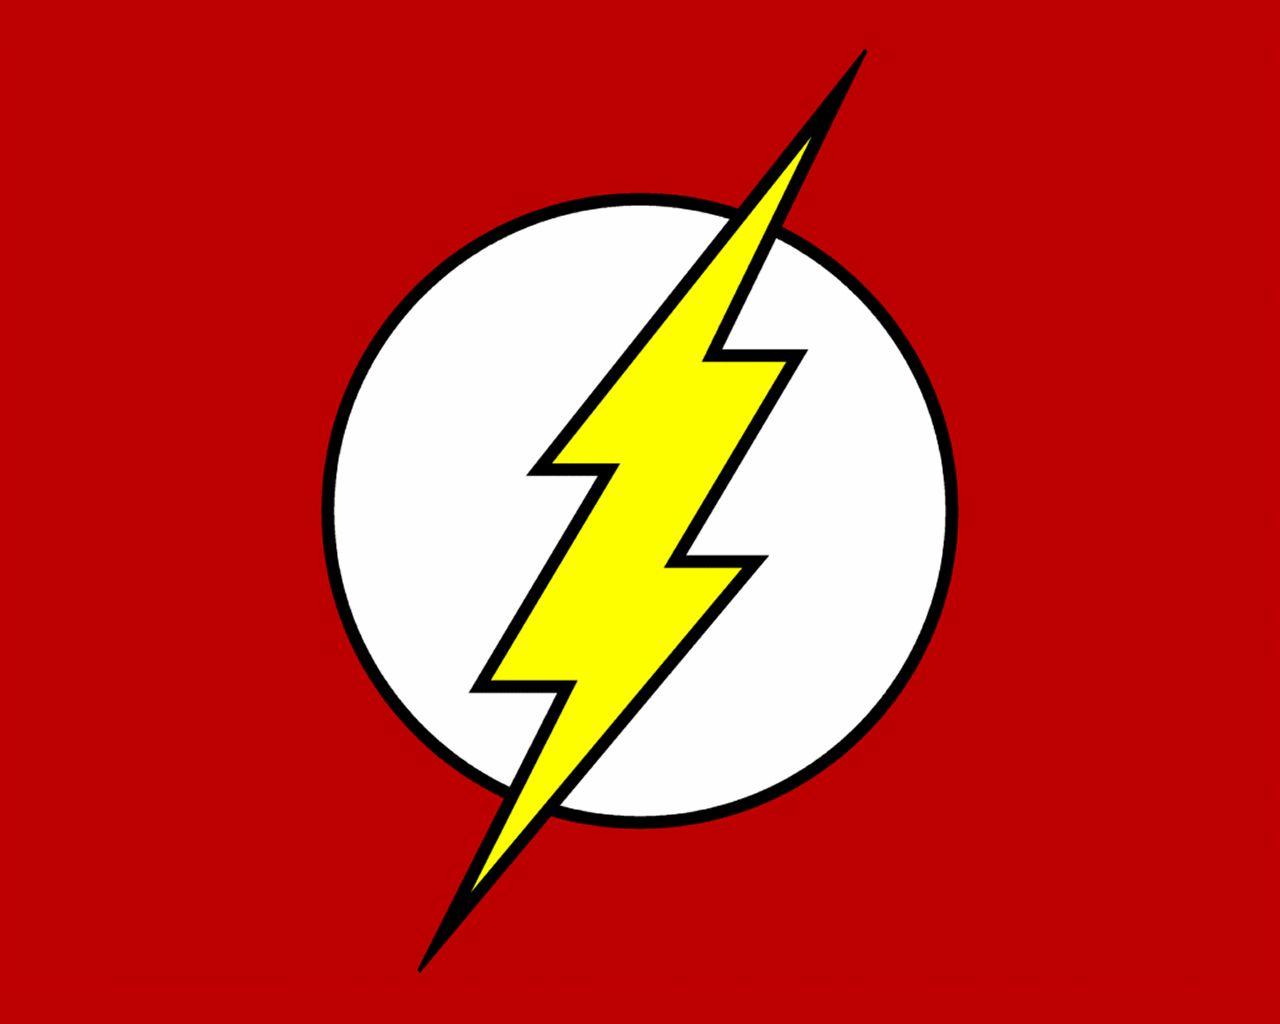 1280x1024 the flash symbol to draw flash superhero, the flash, flash cake